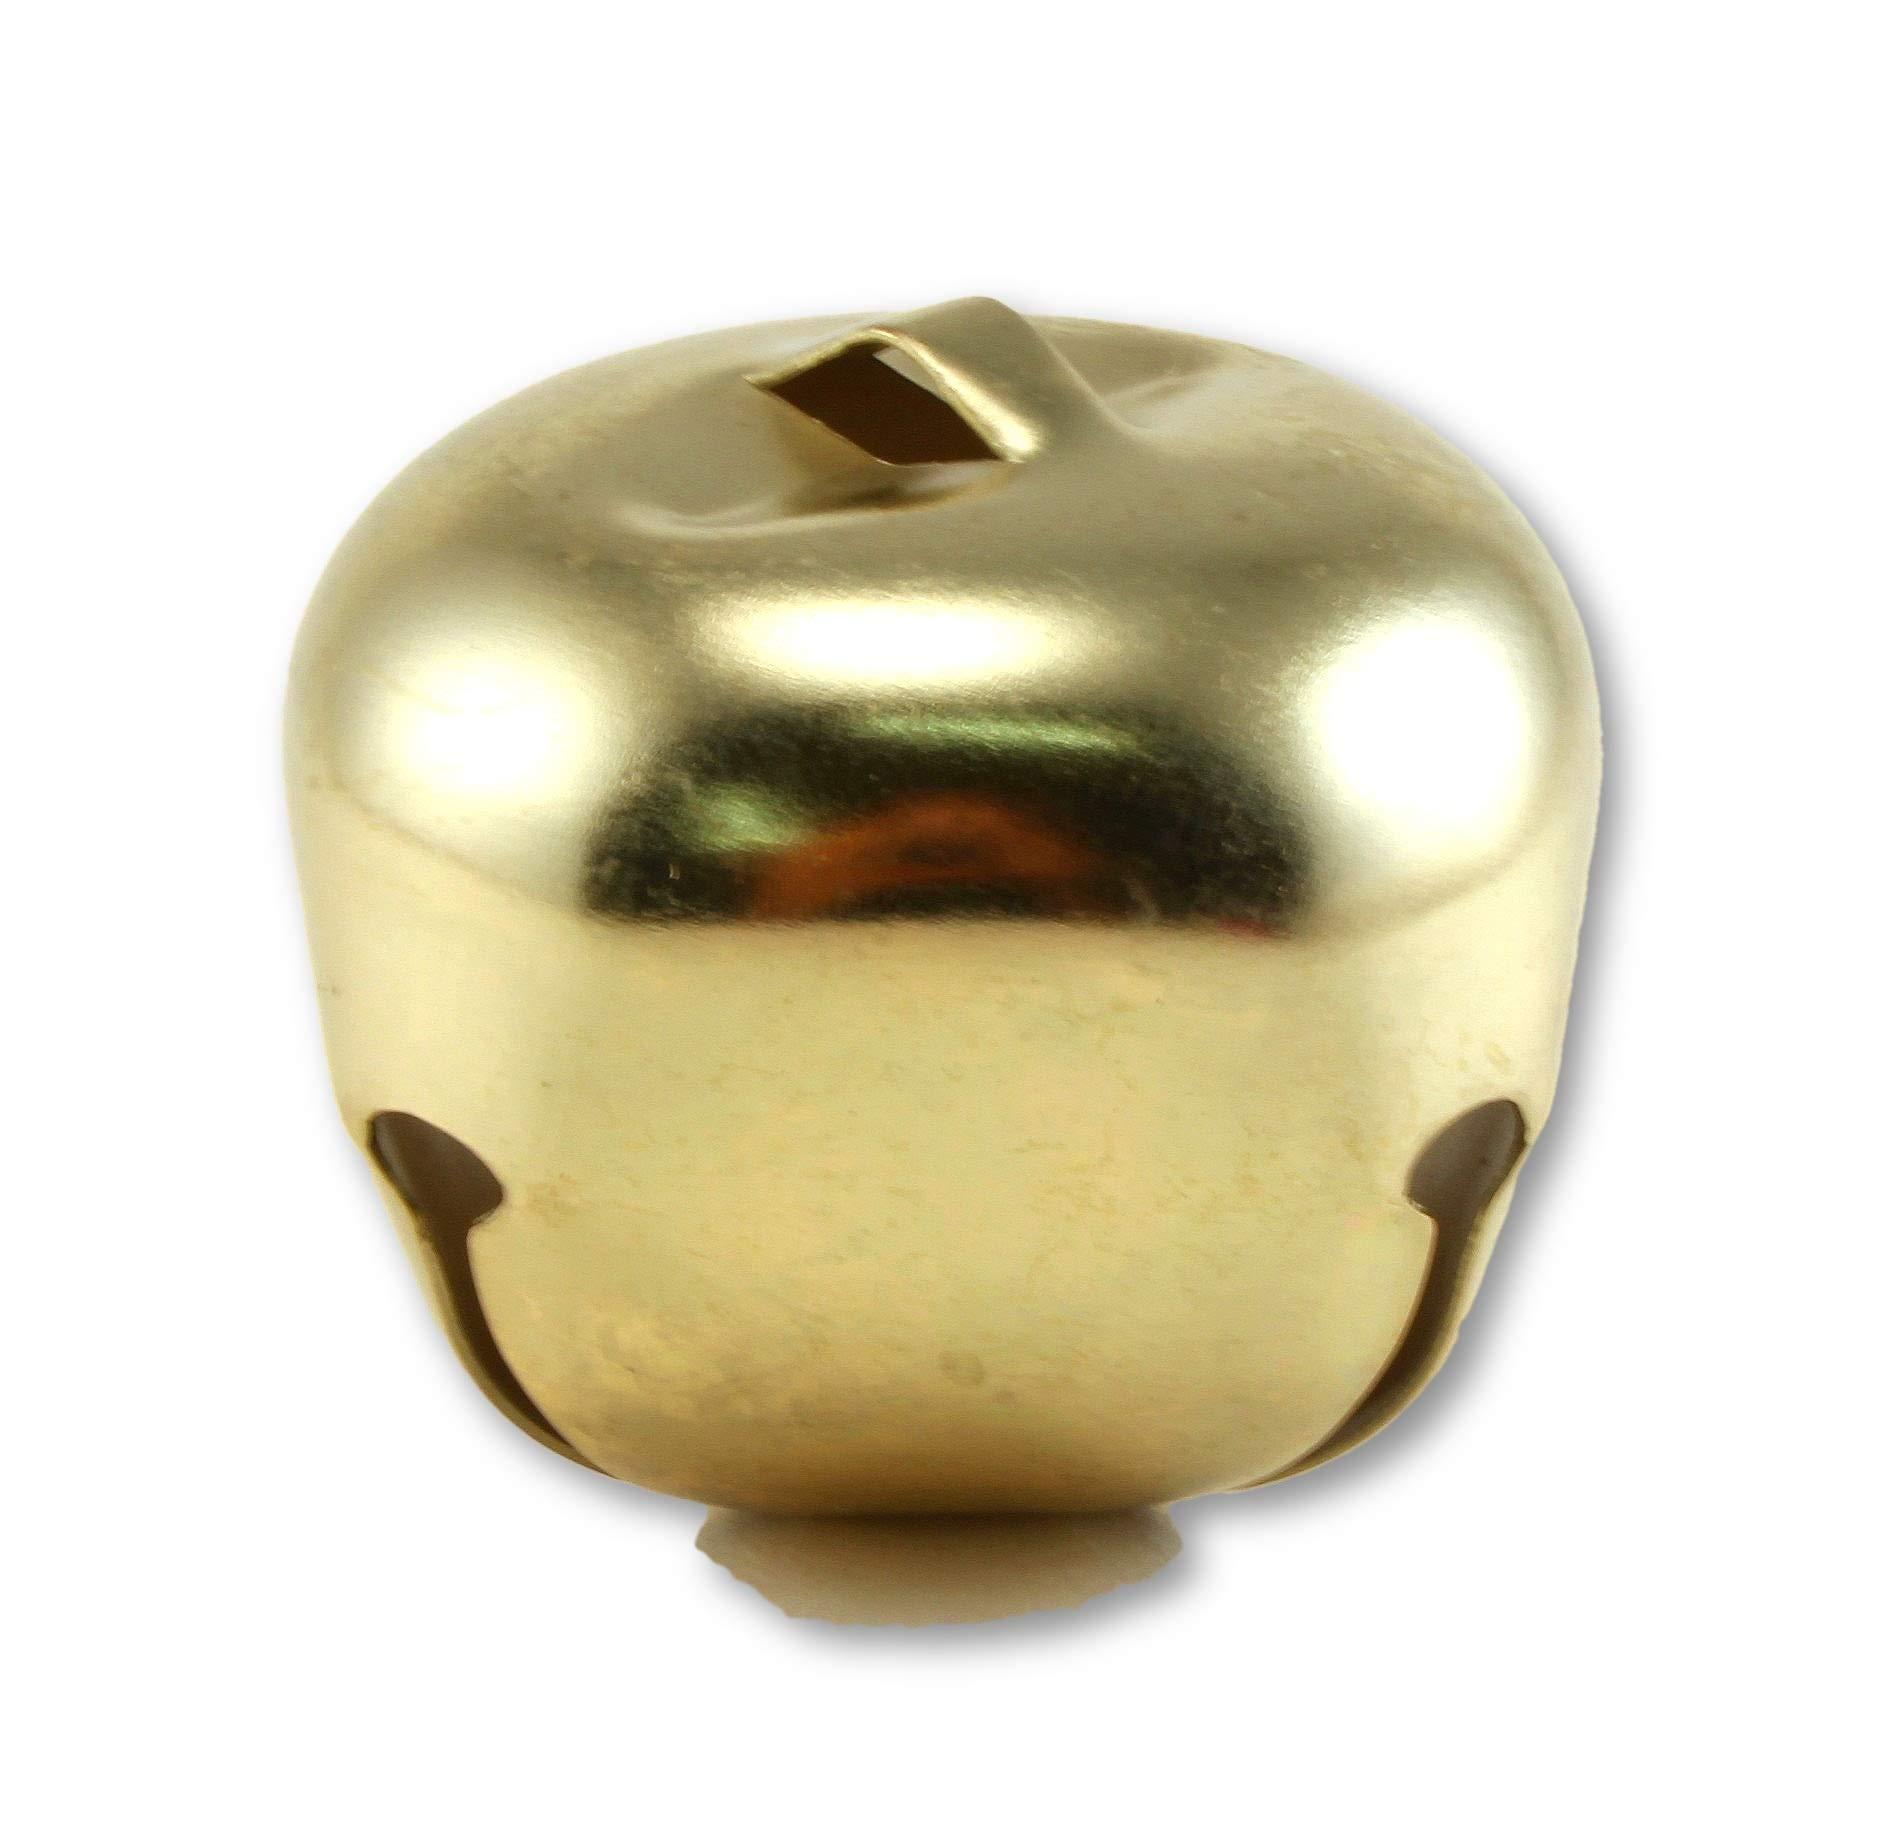 2 Inch 51mm Gold Large Jingle Bells Bulk 100 Pieces